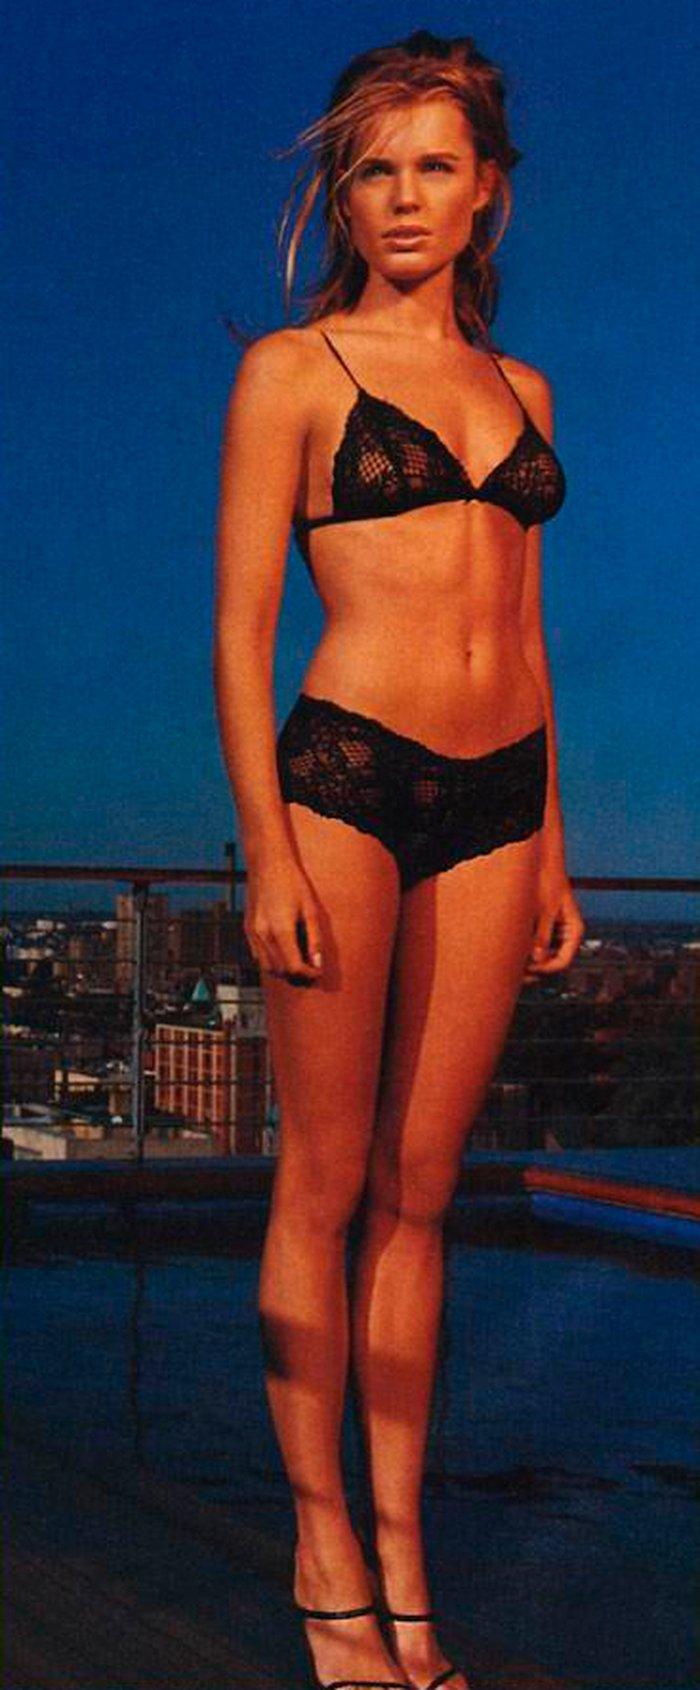 Rebecca Romijn fotos eróticas 5